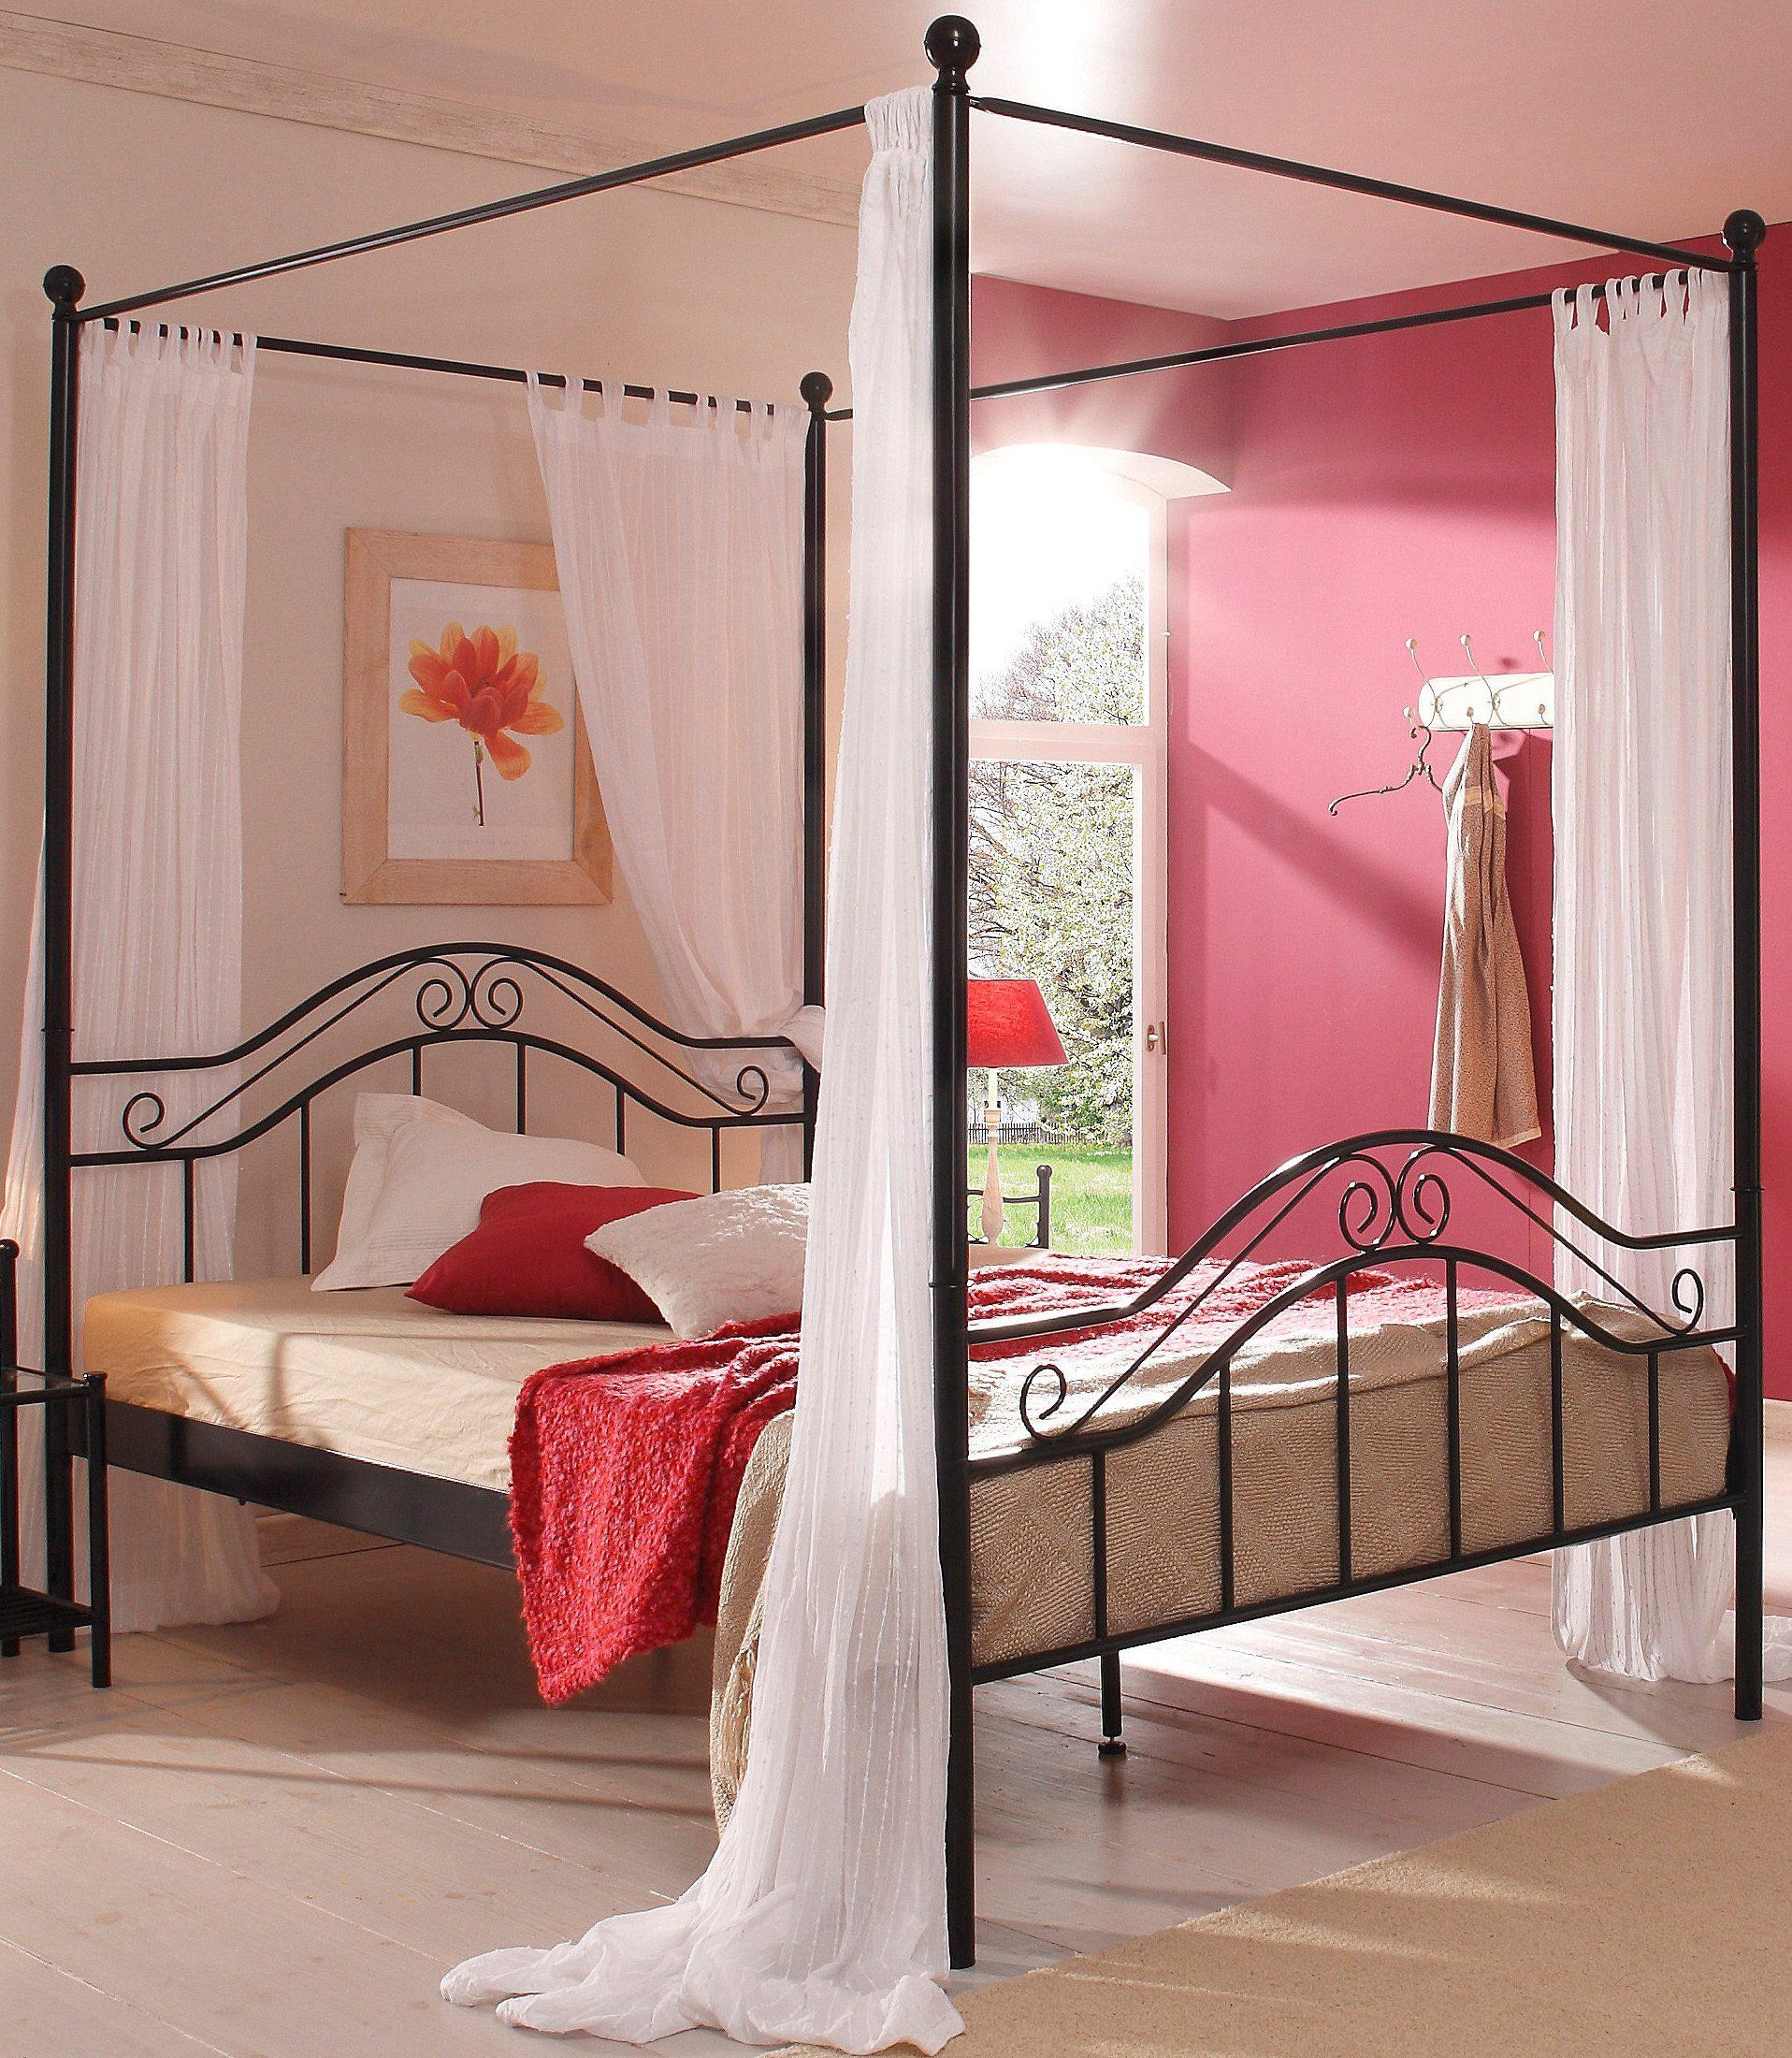 Home affaire Himmelaufsatz | Kinderzimmer > Kinderzimmerdekoration | home affaire